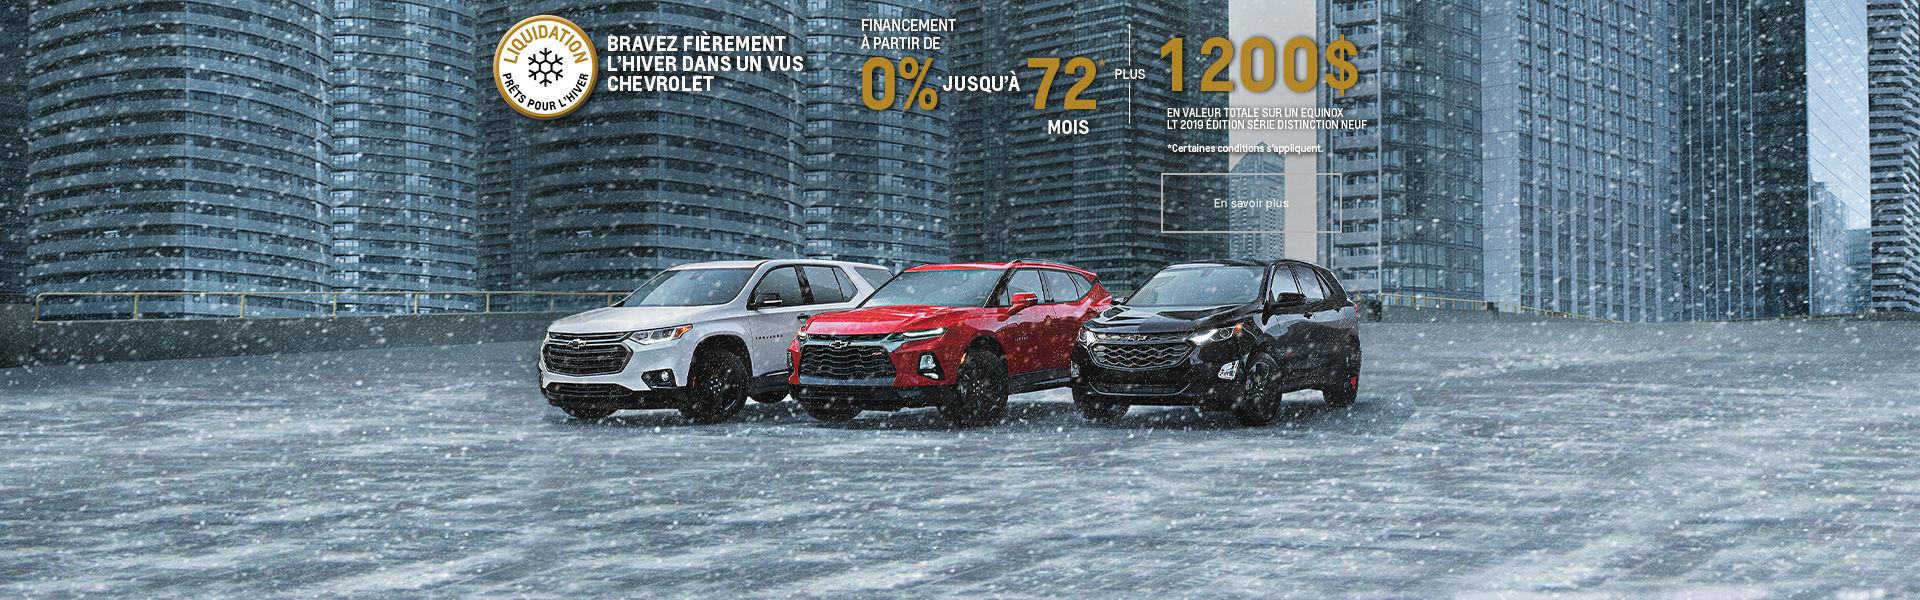 Brenengen Chevrolet Cadillac - Jonesgruel